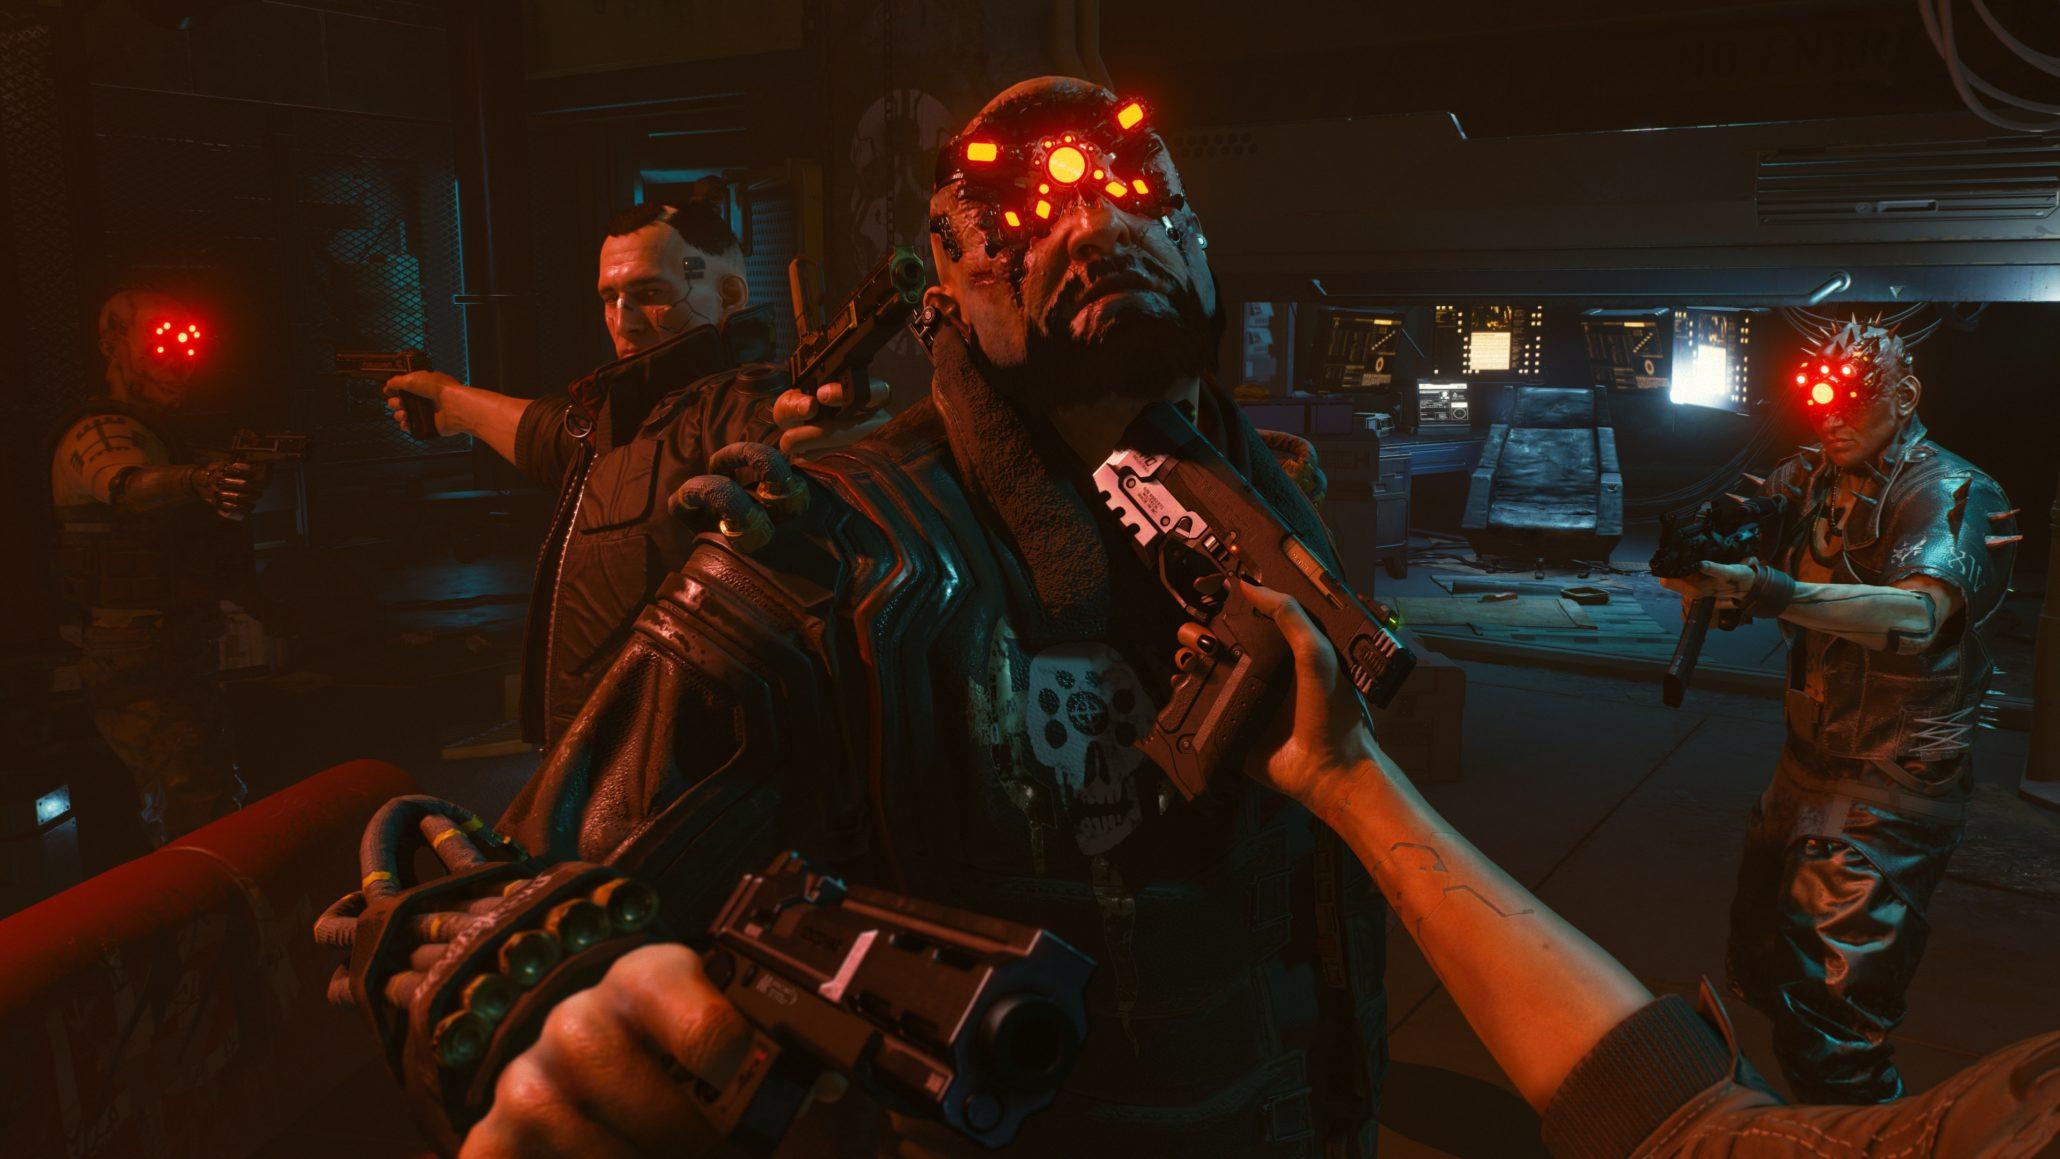 Cyberpunk 2077 — release date, pre-orders, new trailer ...